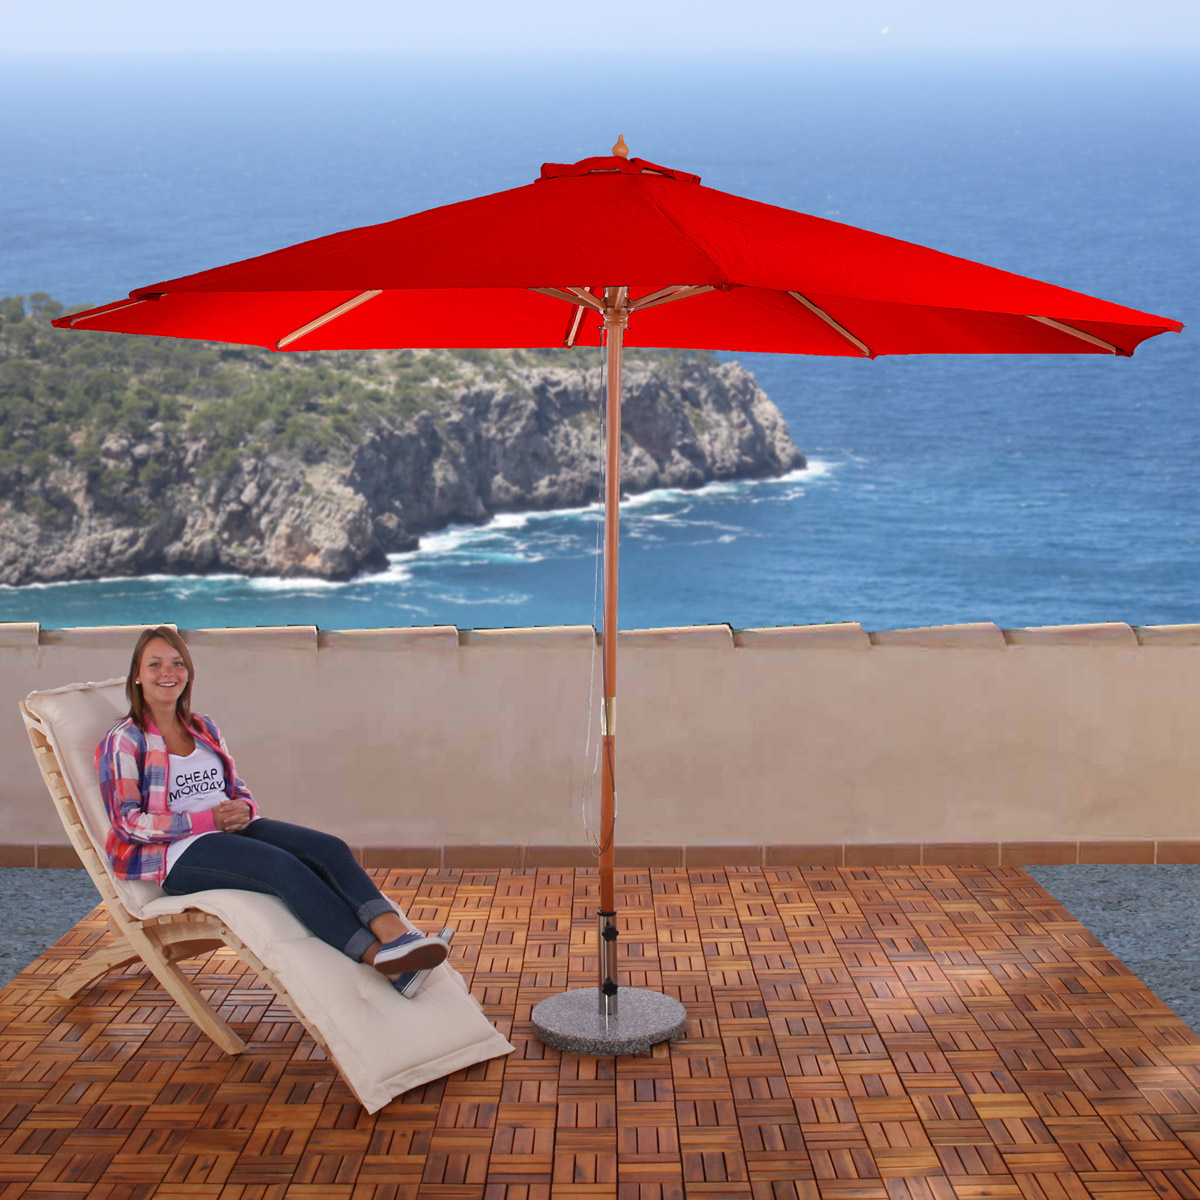 sonnenschirm florida gartenschirm marktschirm 3 5m polyester holz 7kg bordeau. Black Bedroom Furniture Sets. Home Design Ideas